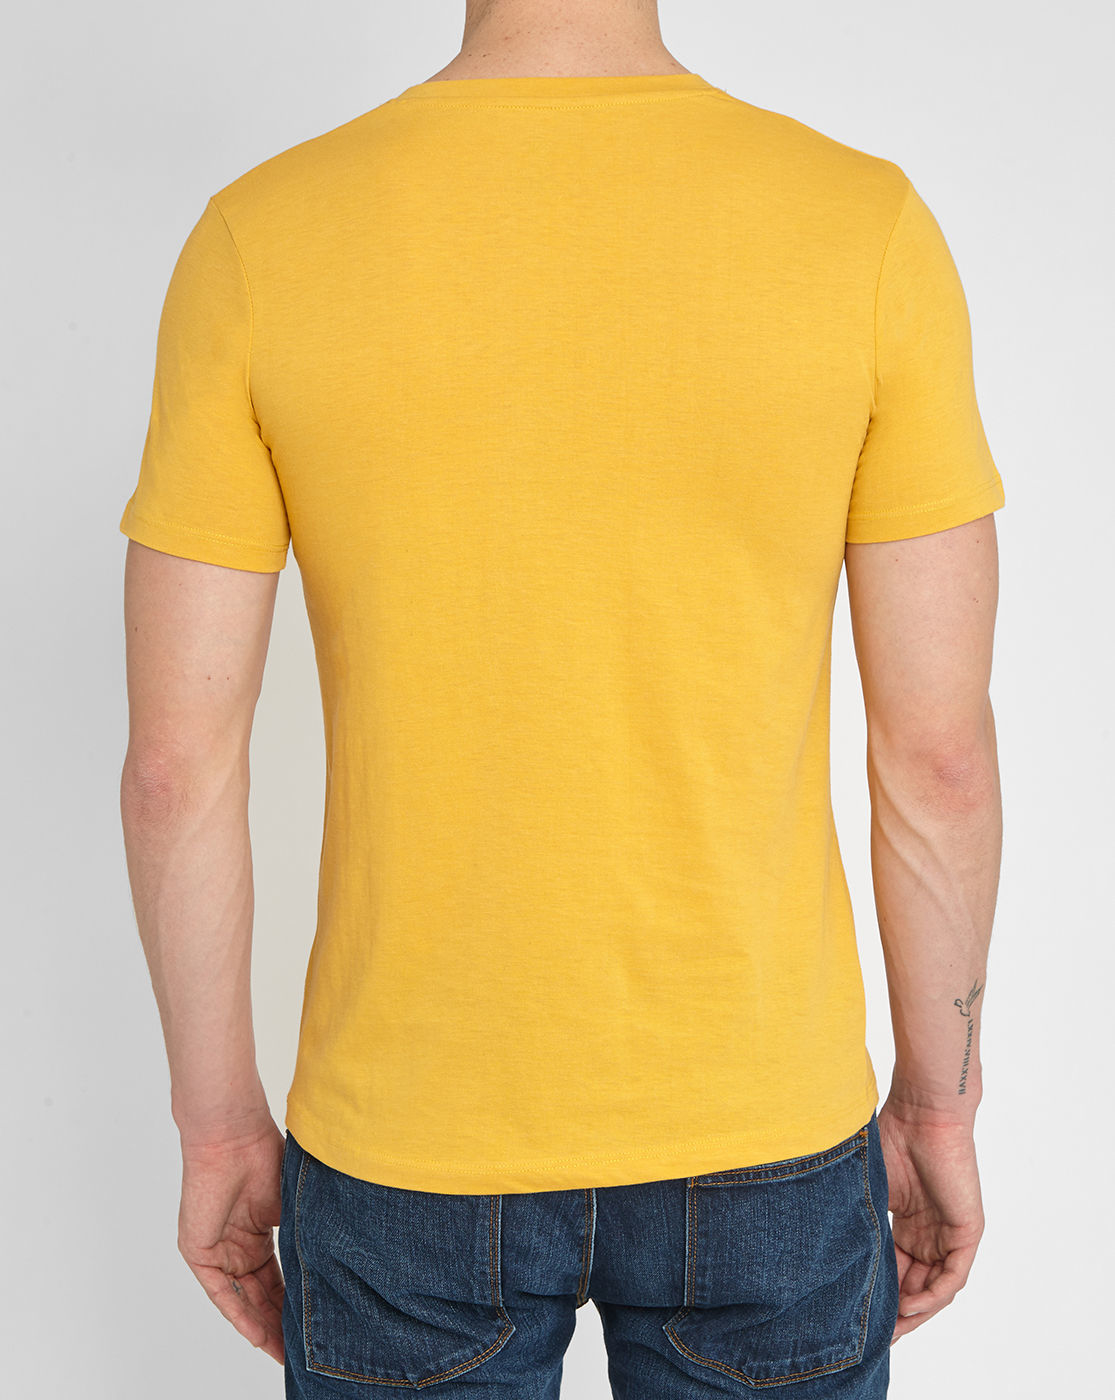 M.studio Mottled Warm-yellow Emile Jersey V-neck T-shirt ...